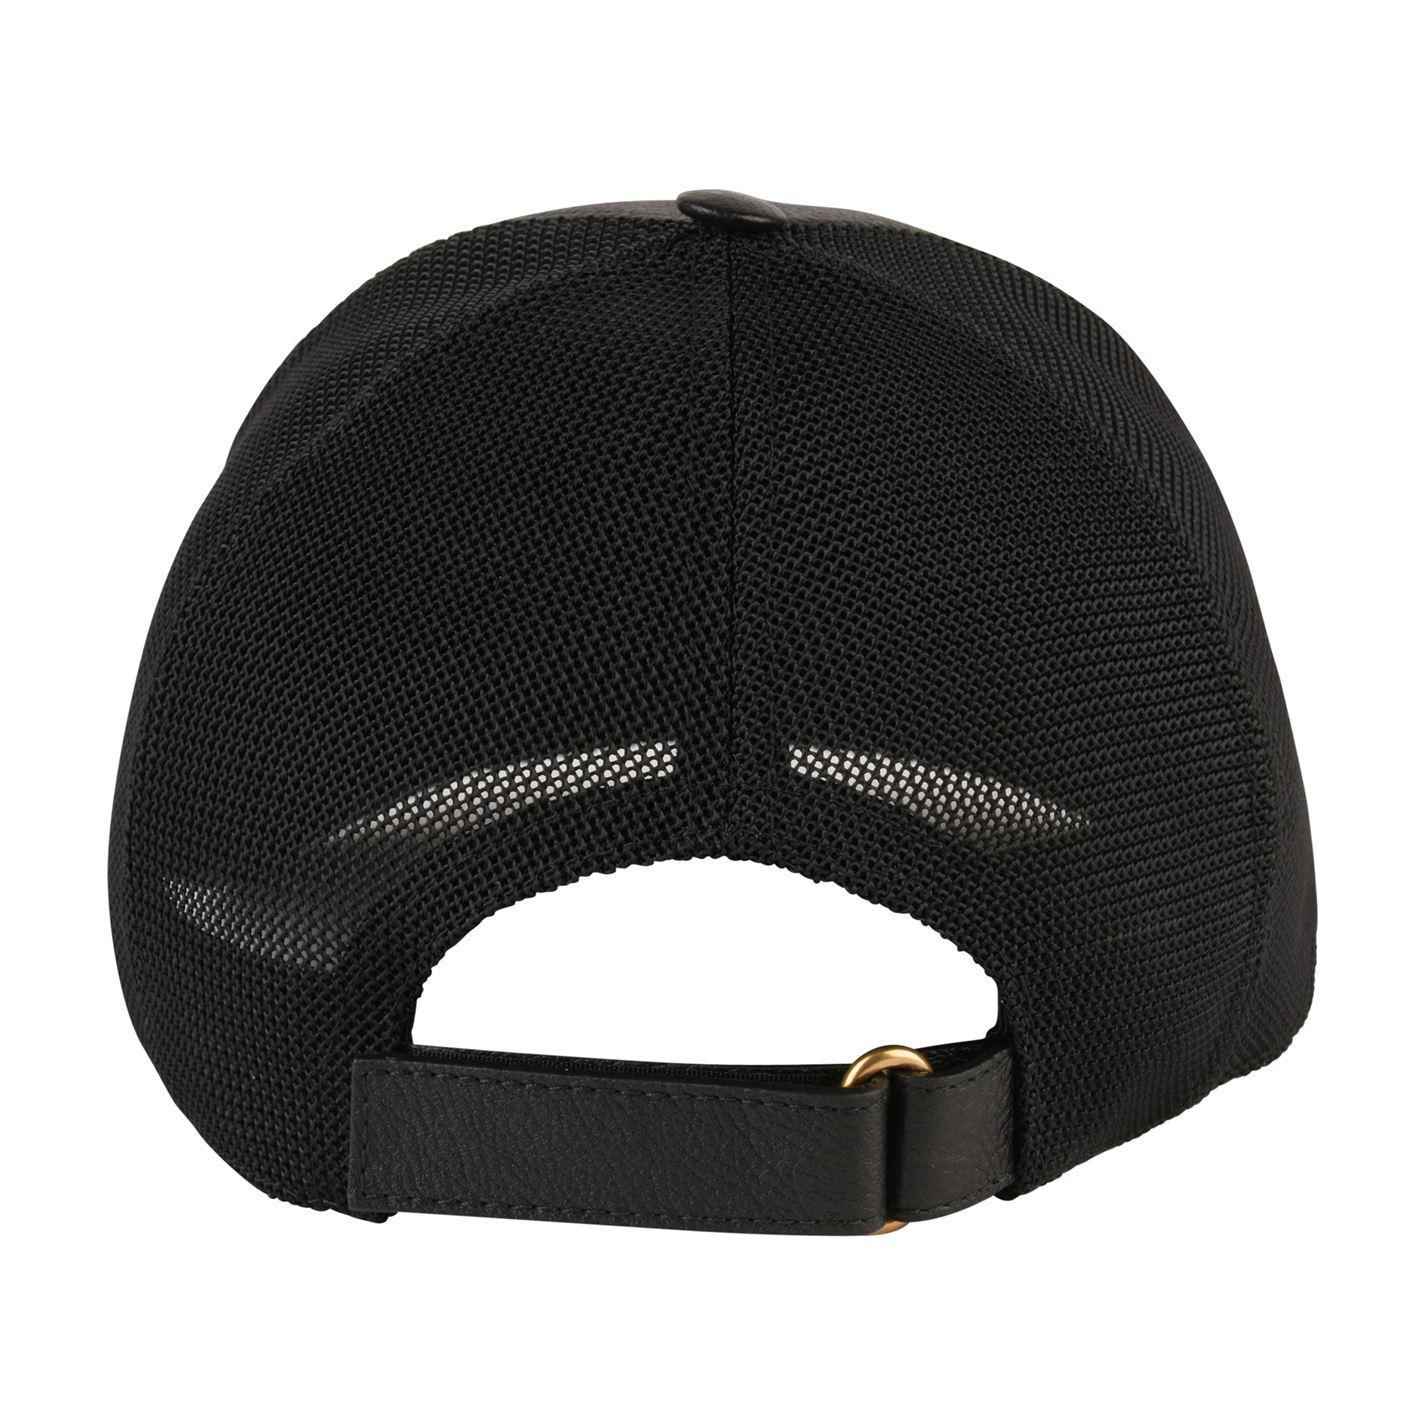 624bc20c7c4 Gucci - Black Fake Logo Leather Cap for Men - Lyst. View fullscreen